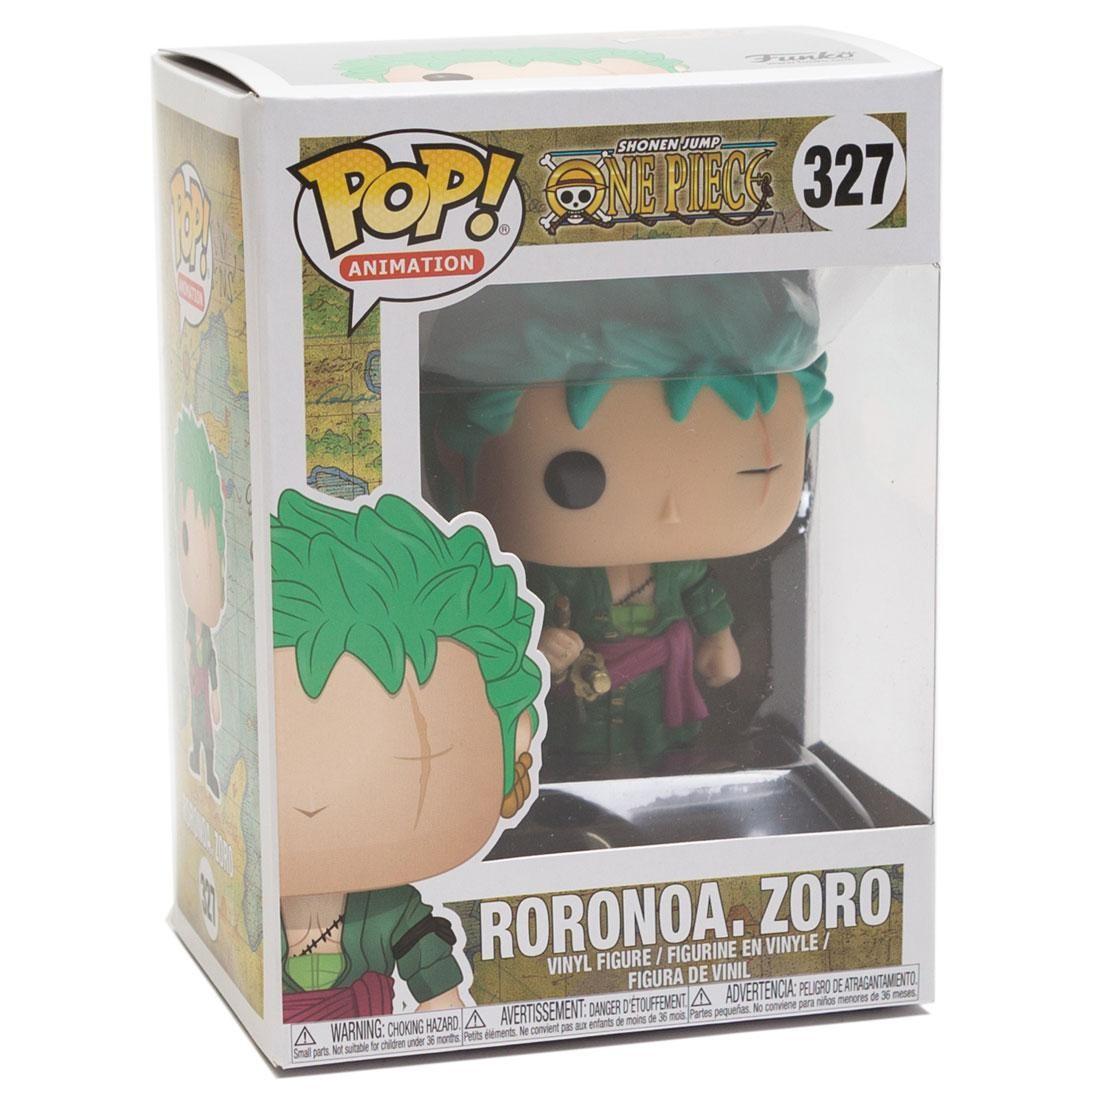 Roronoa. Zoro #327 - One Piece - Funko Pop! Animation